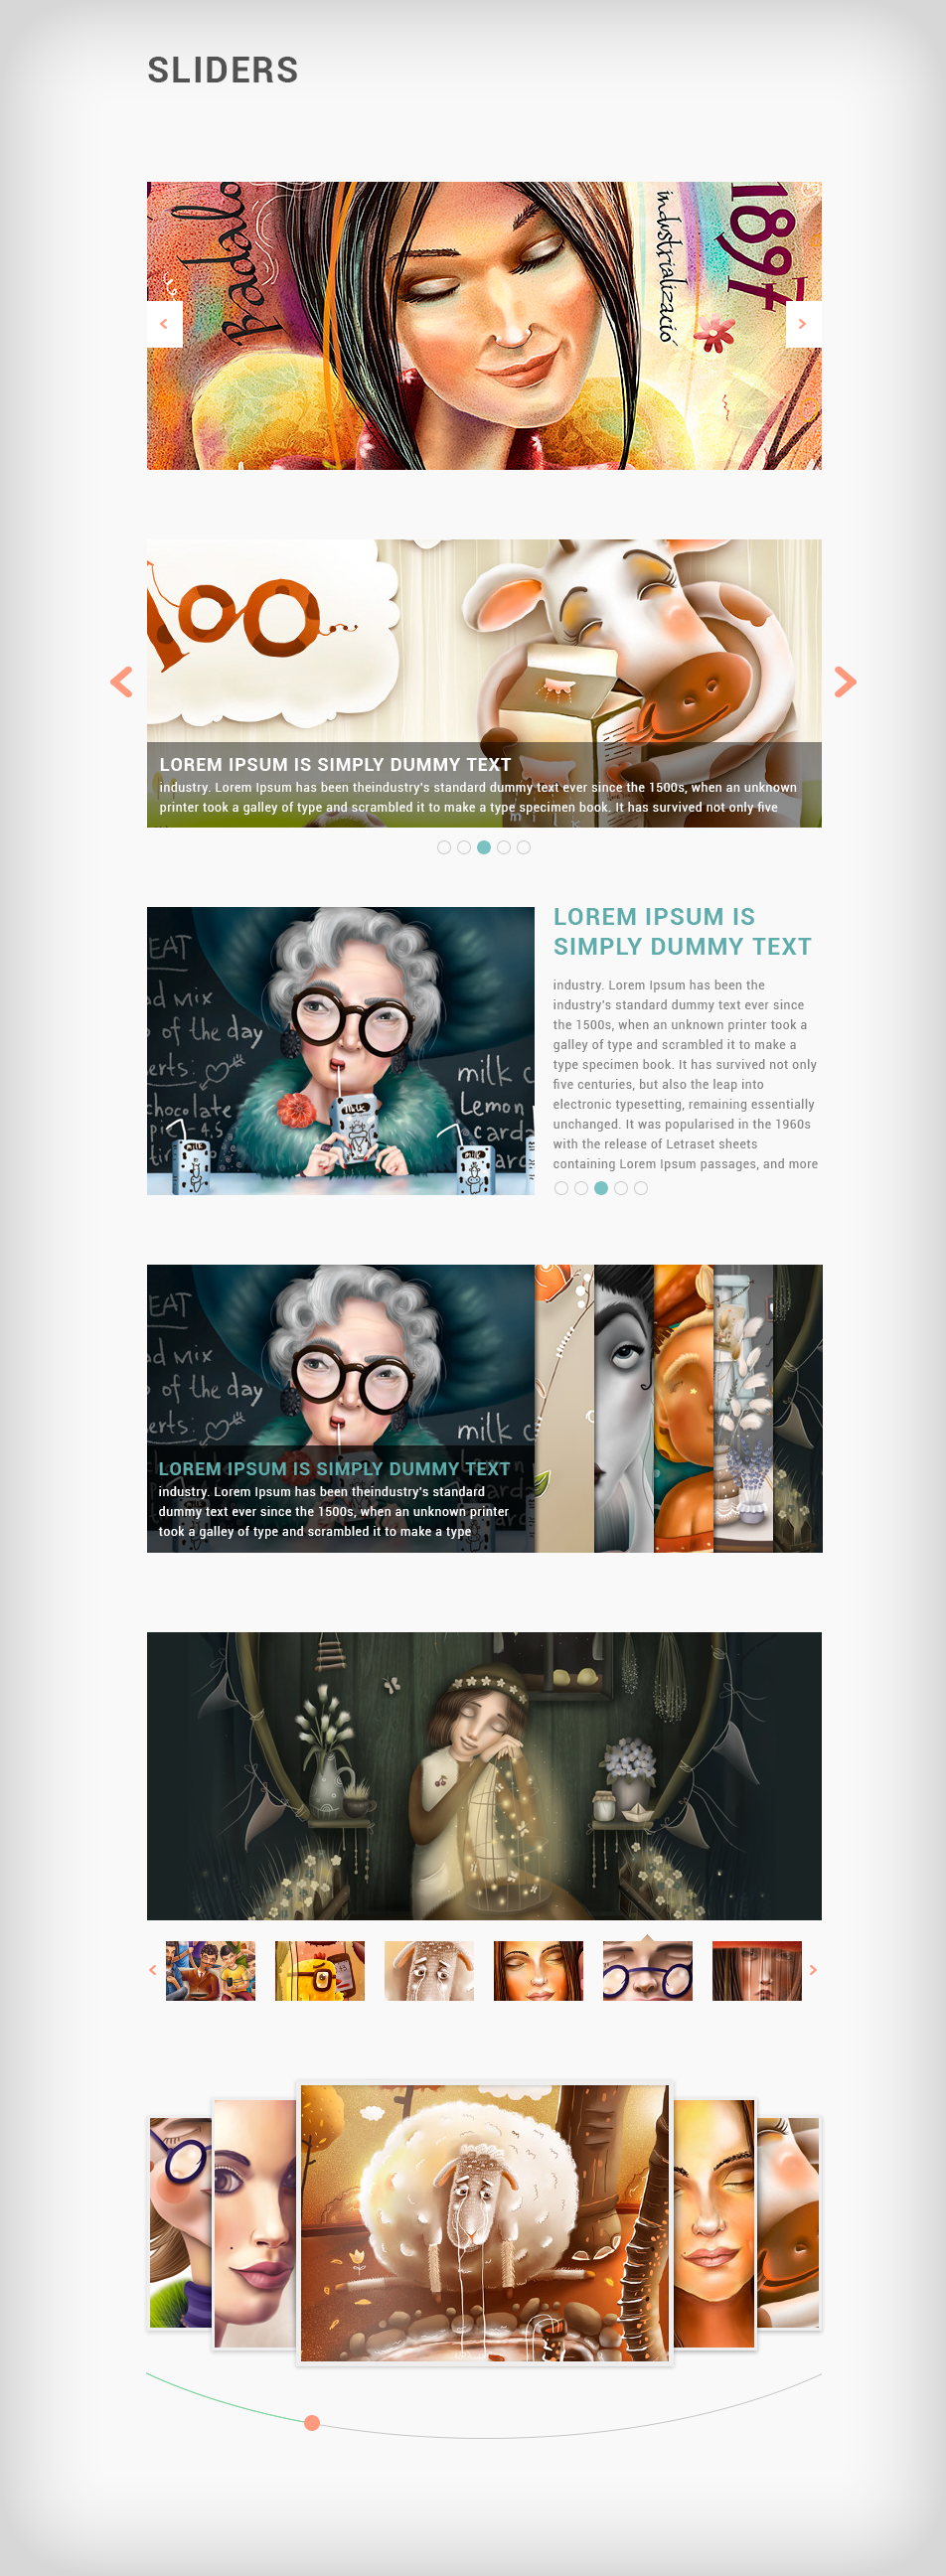 Pixels - clean design for blog & portfolio